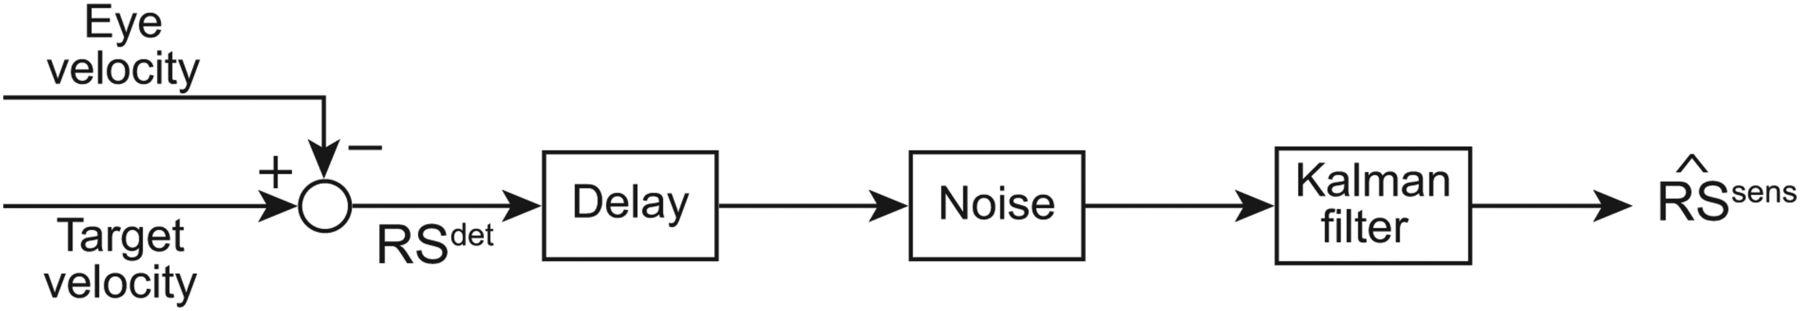 Kalman Filtering Naturally Accounts for Visually Guided and